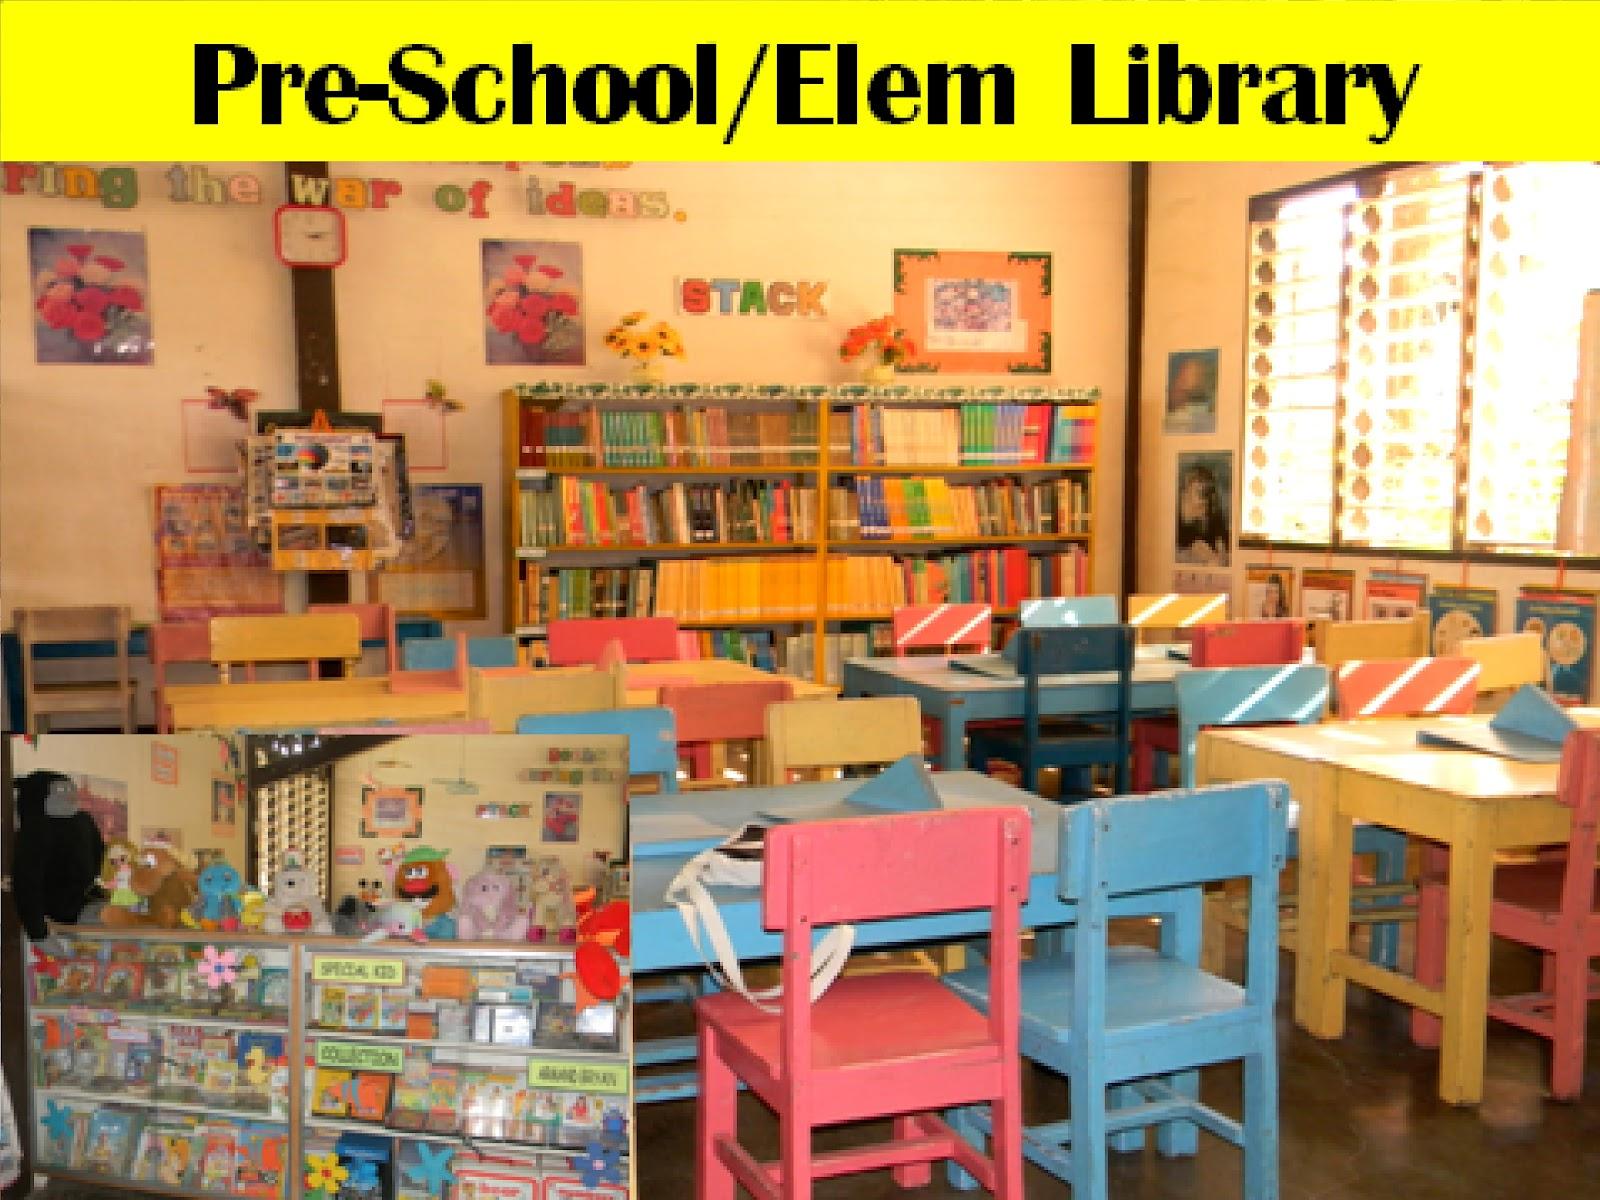 Preschool And Elementary School